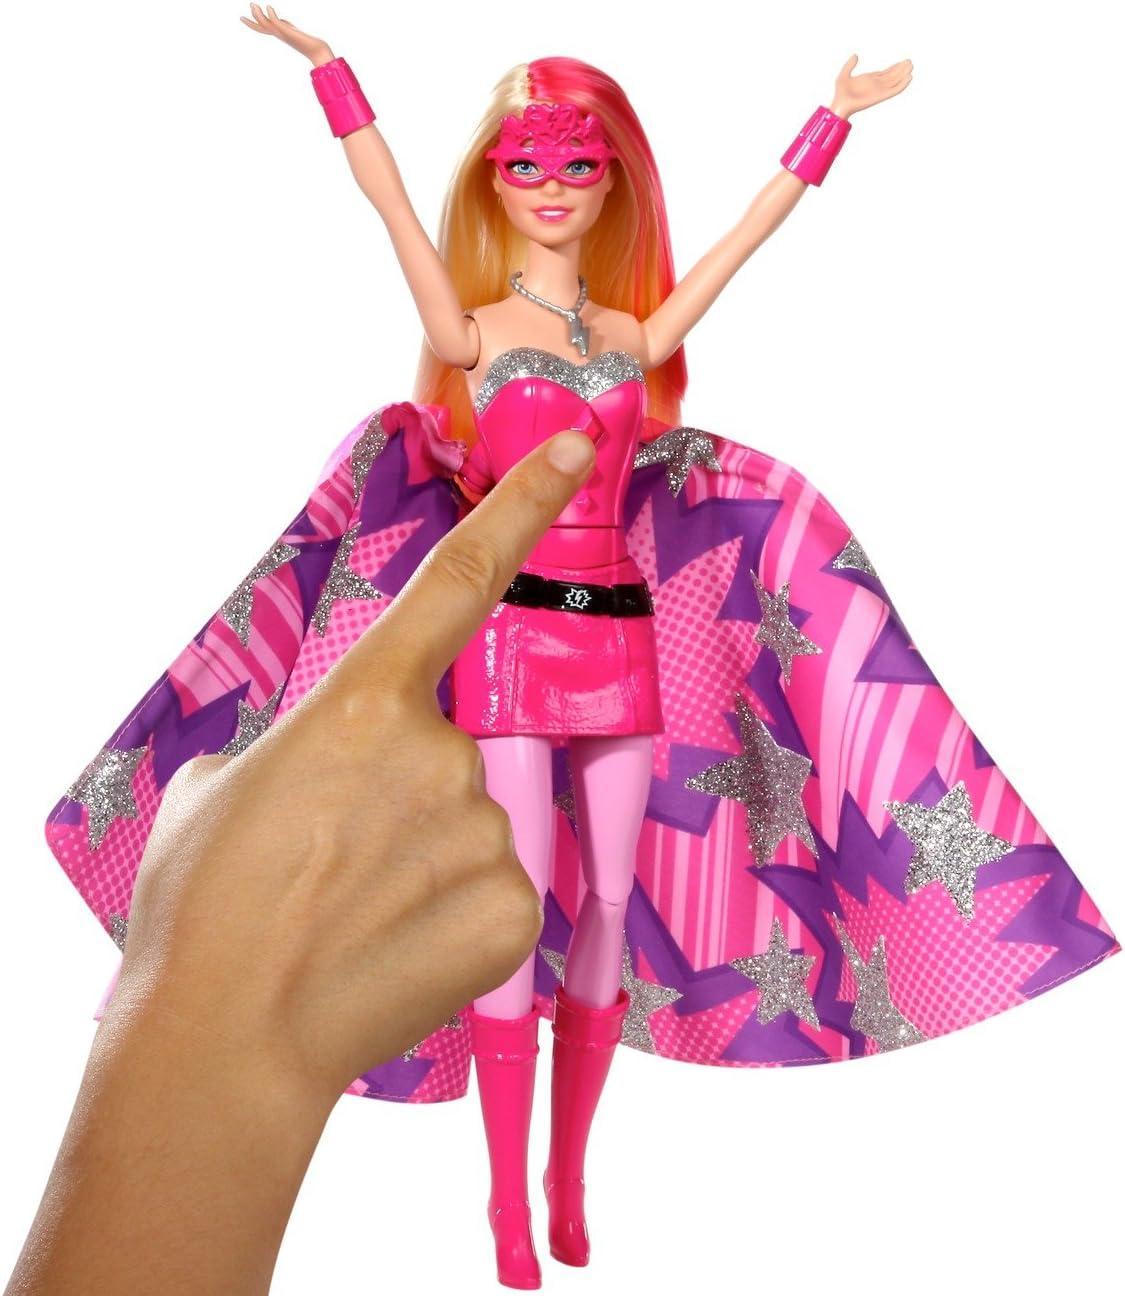 Barbie in Princess Power Superhero Doll In Pink *Spins To Transform* MATTEL